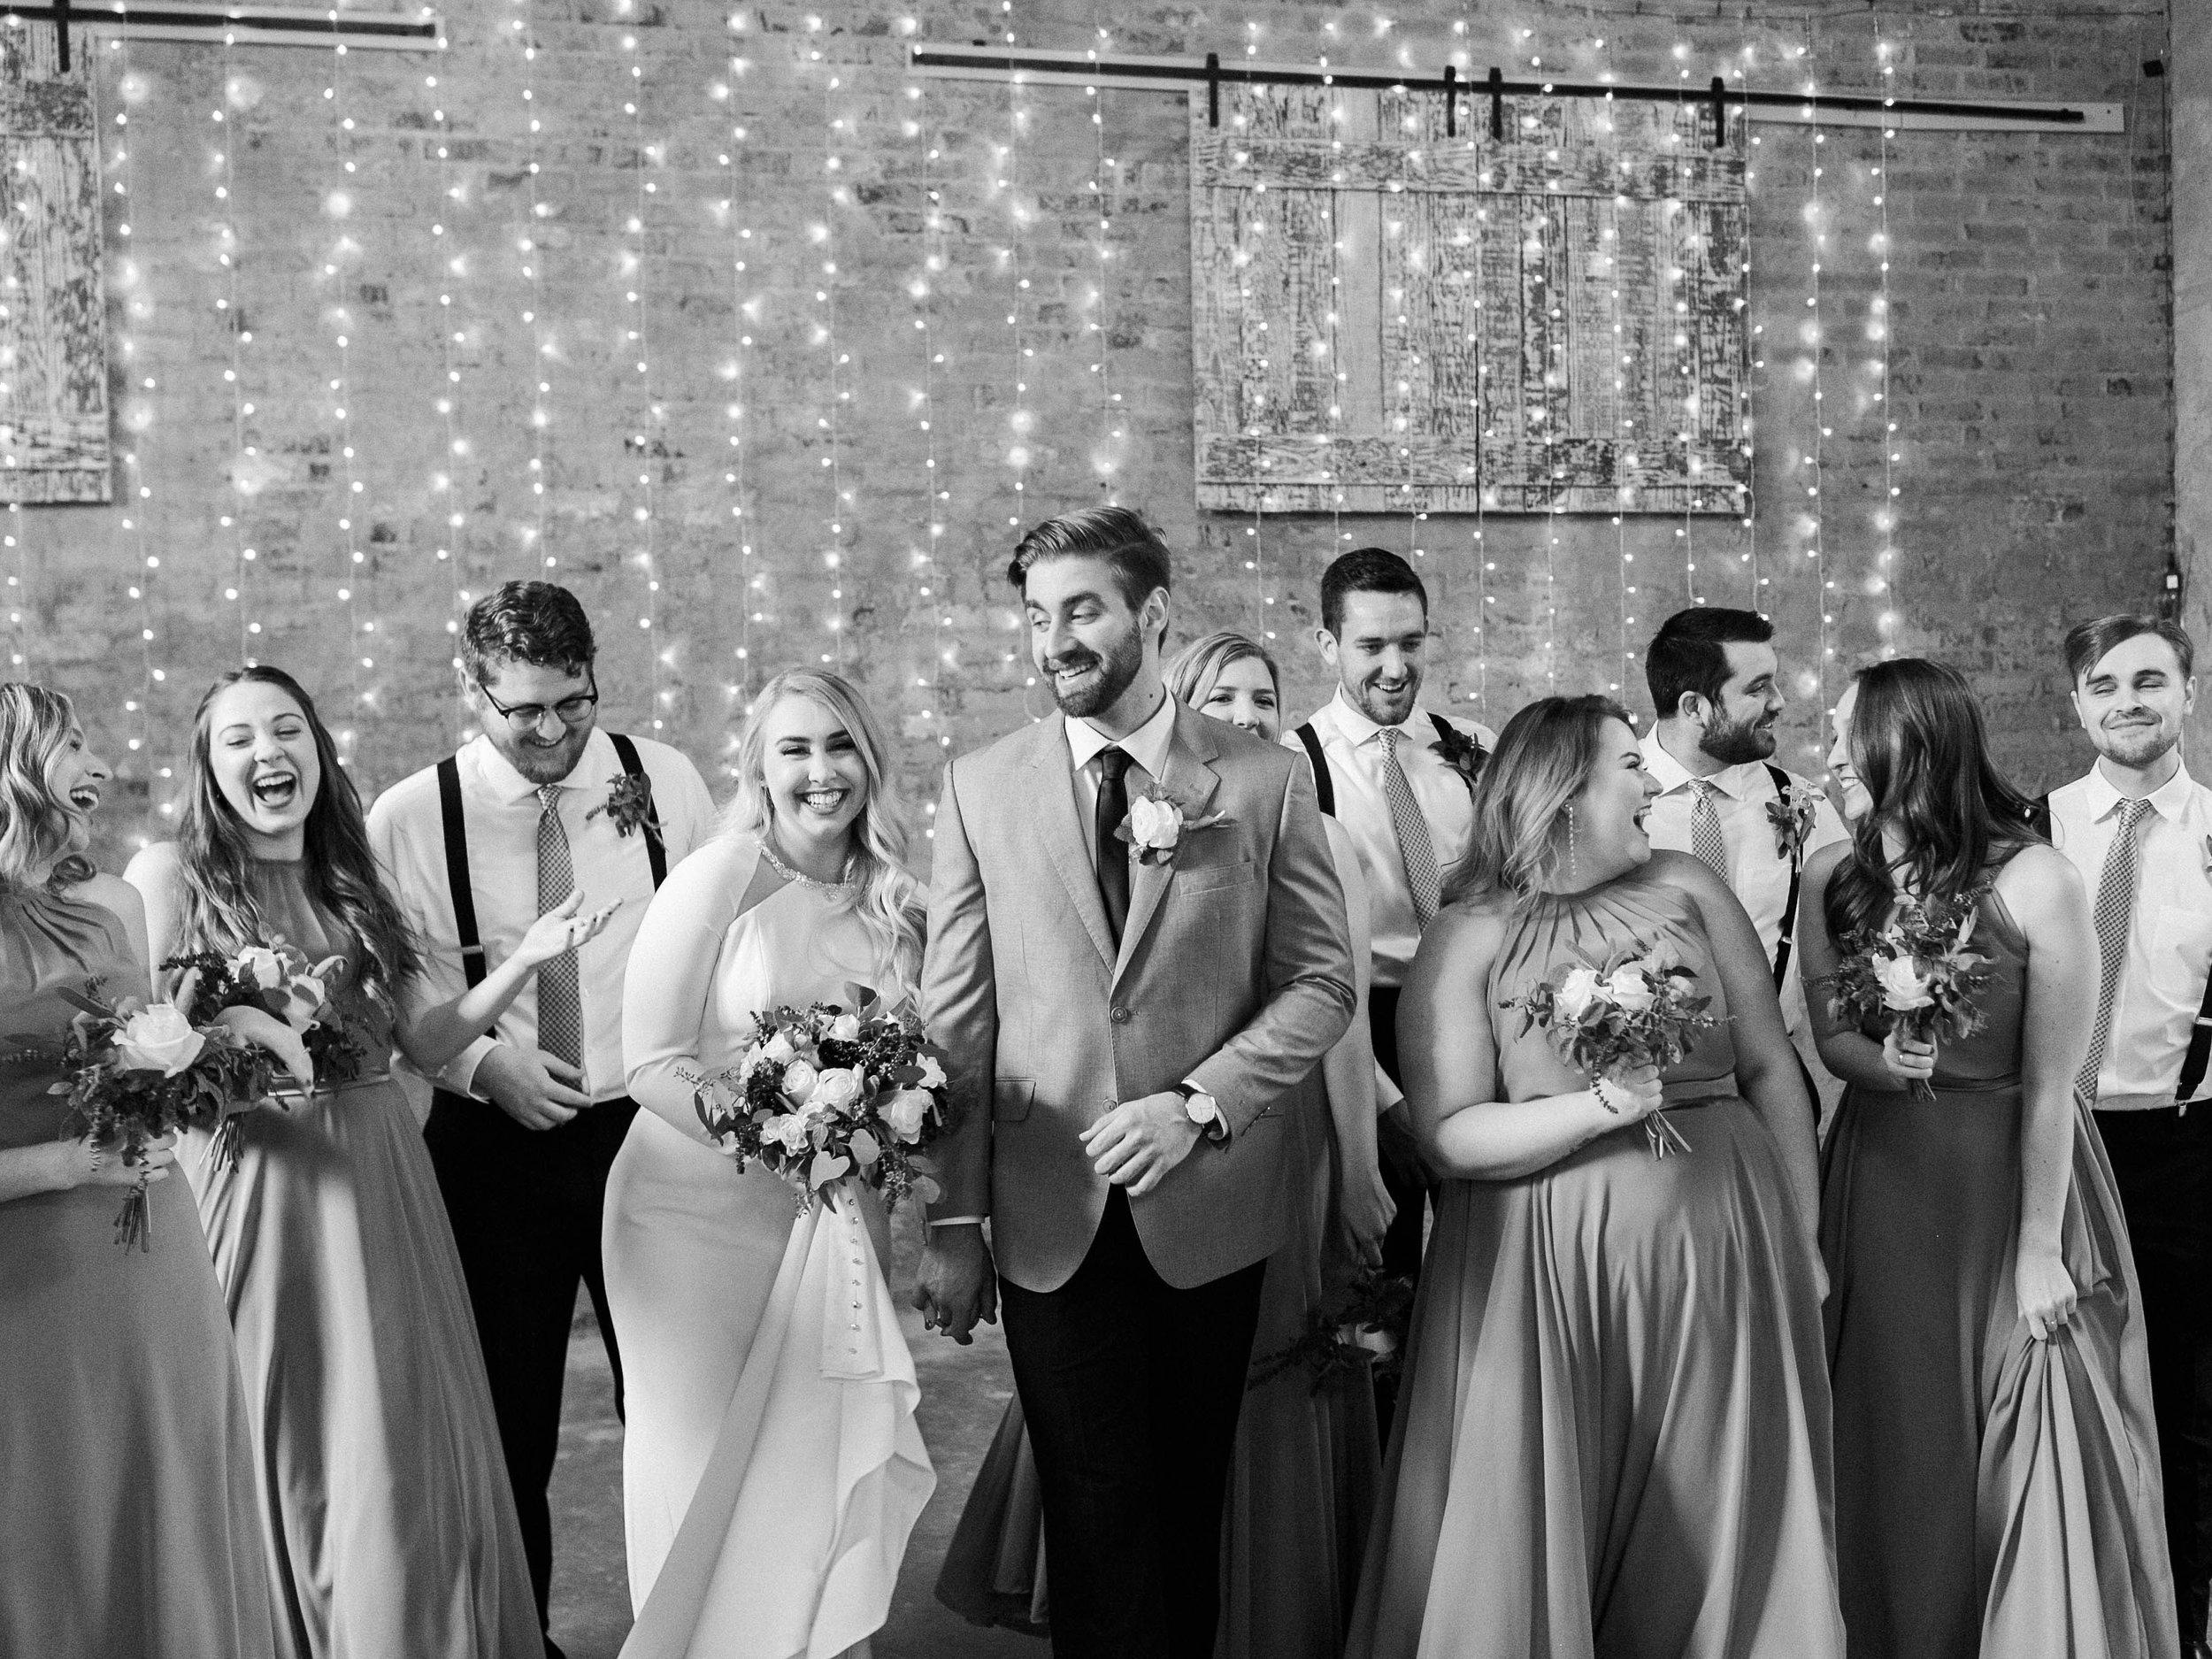 folkeswedding-243.jpg